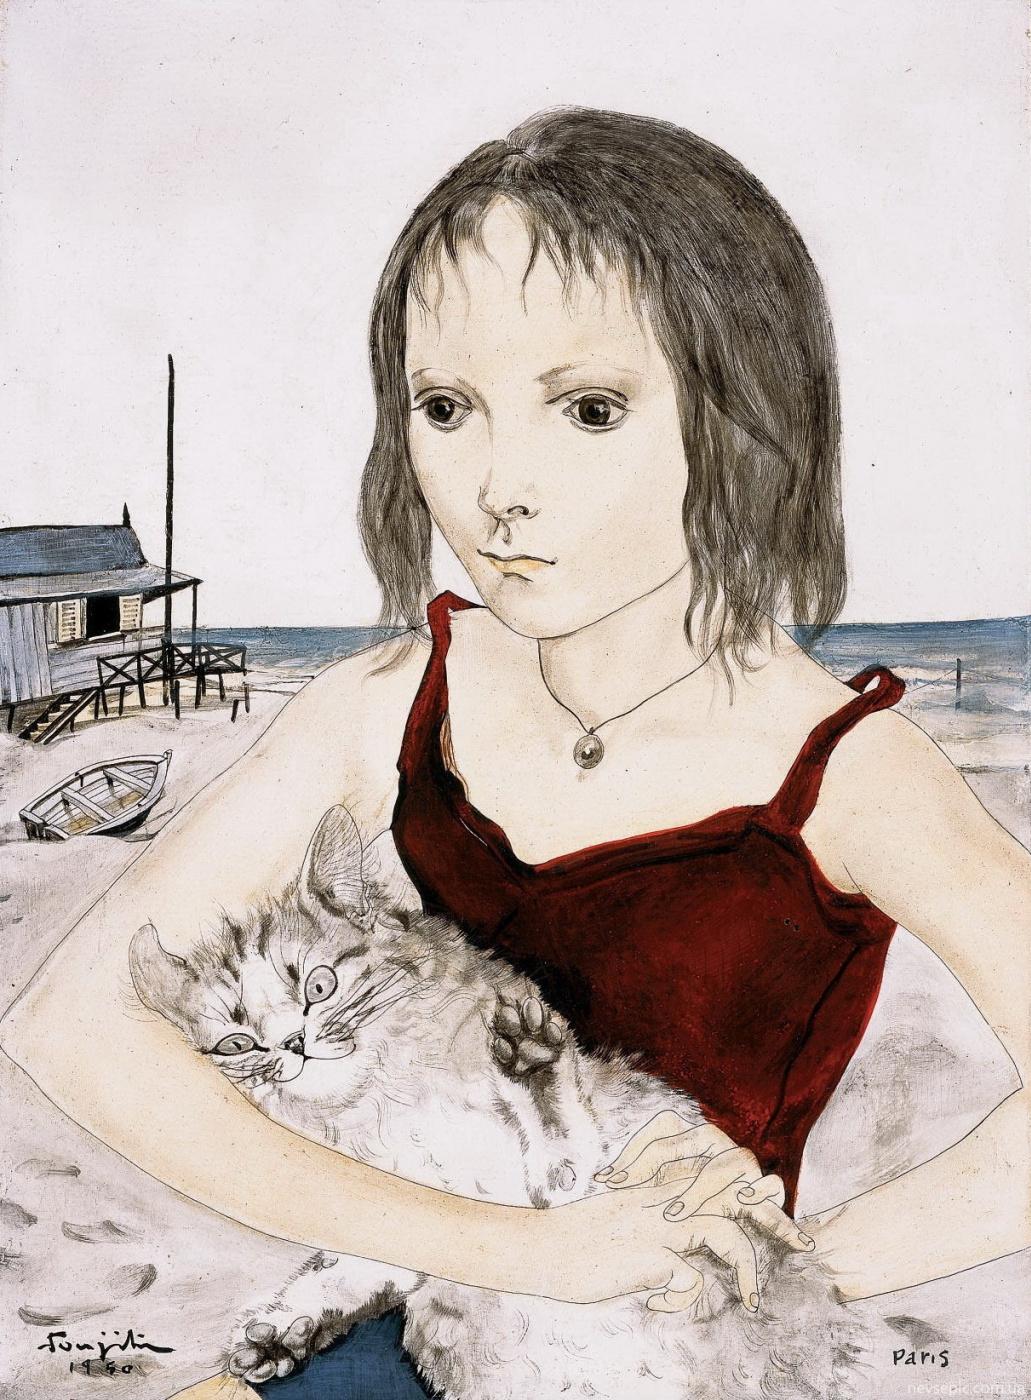 Tsuguharu Foujita (Léonard Fujita). Young Girl with Her Cat on the Beach